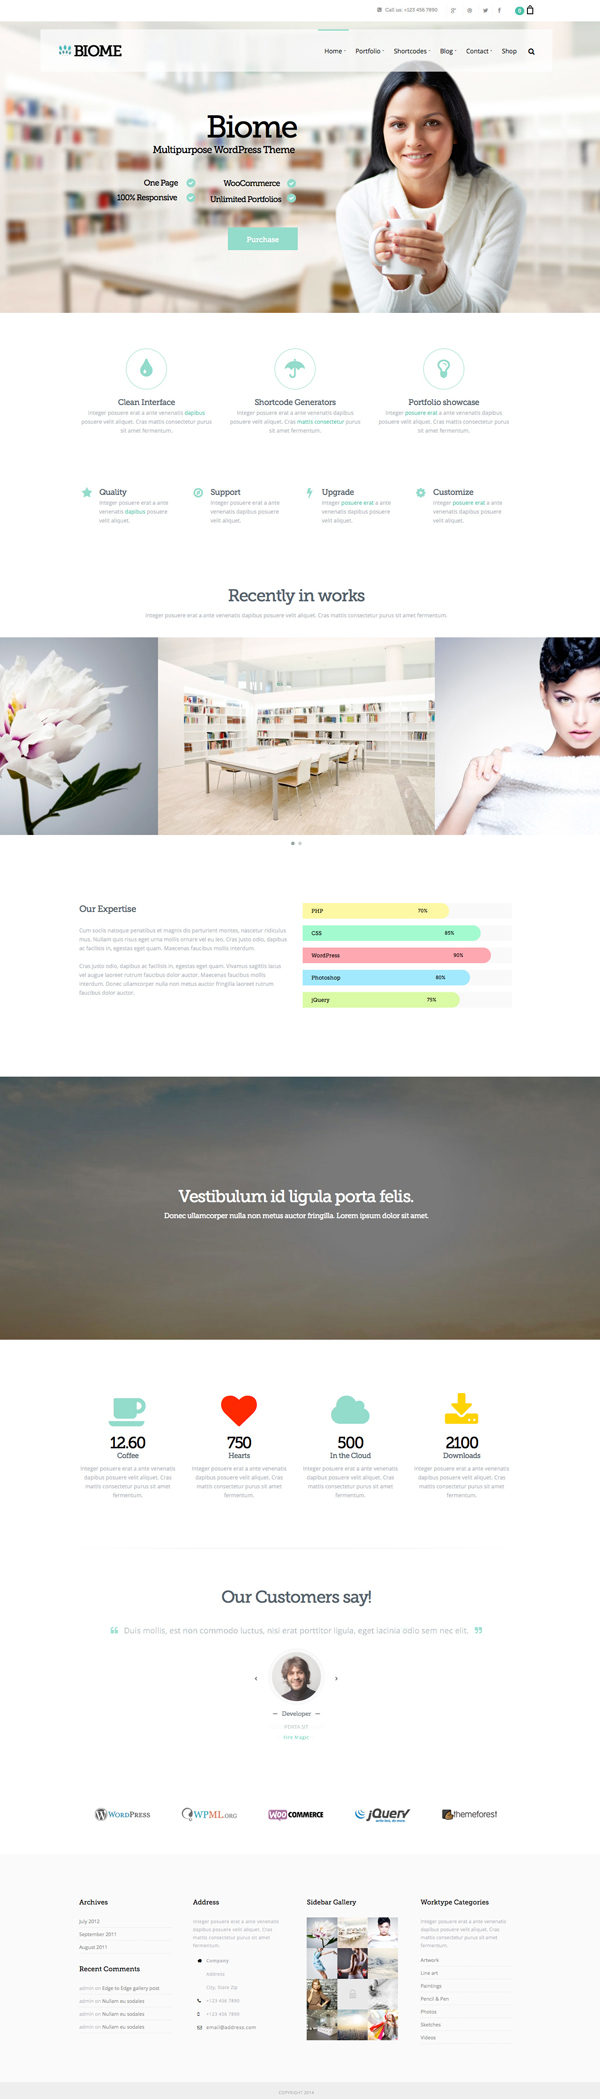 Biome - Multipurpose One Page WordPress Theme